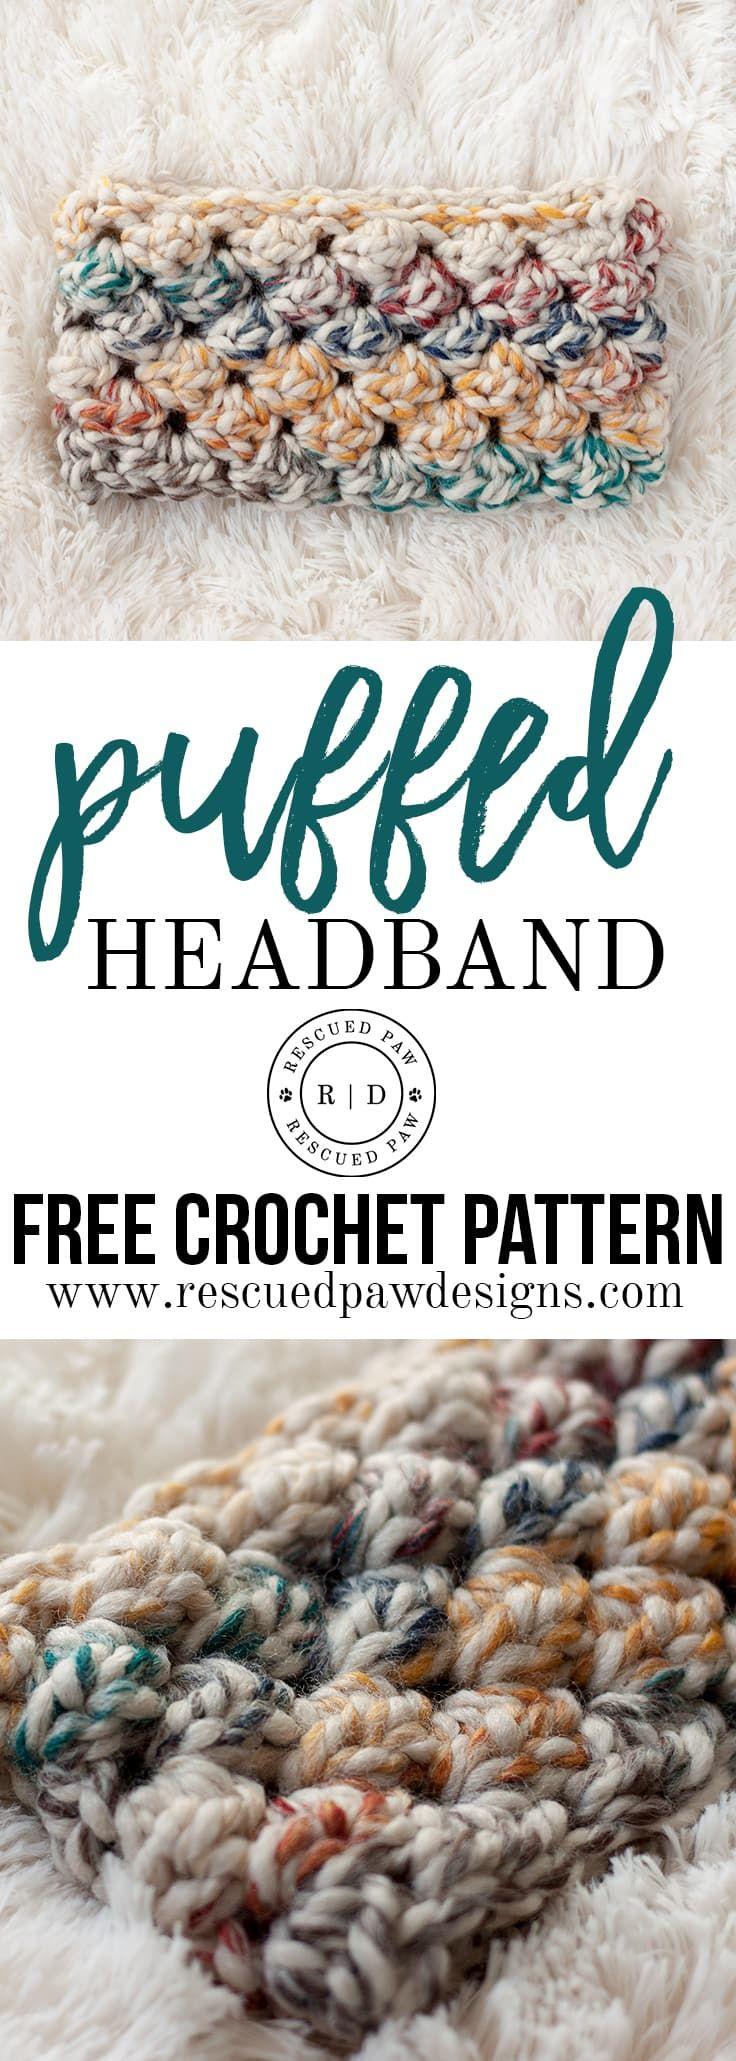 Puffed Headband FREE Crochet Pattern | Puntadas, Tejido y Ganchillo